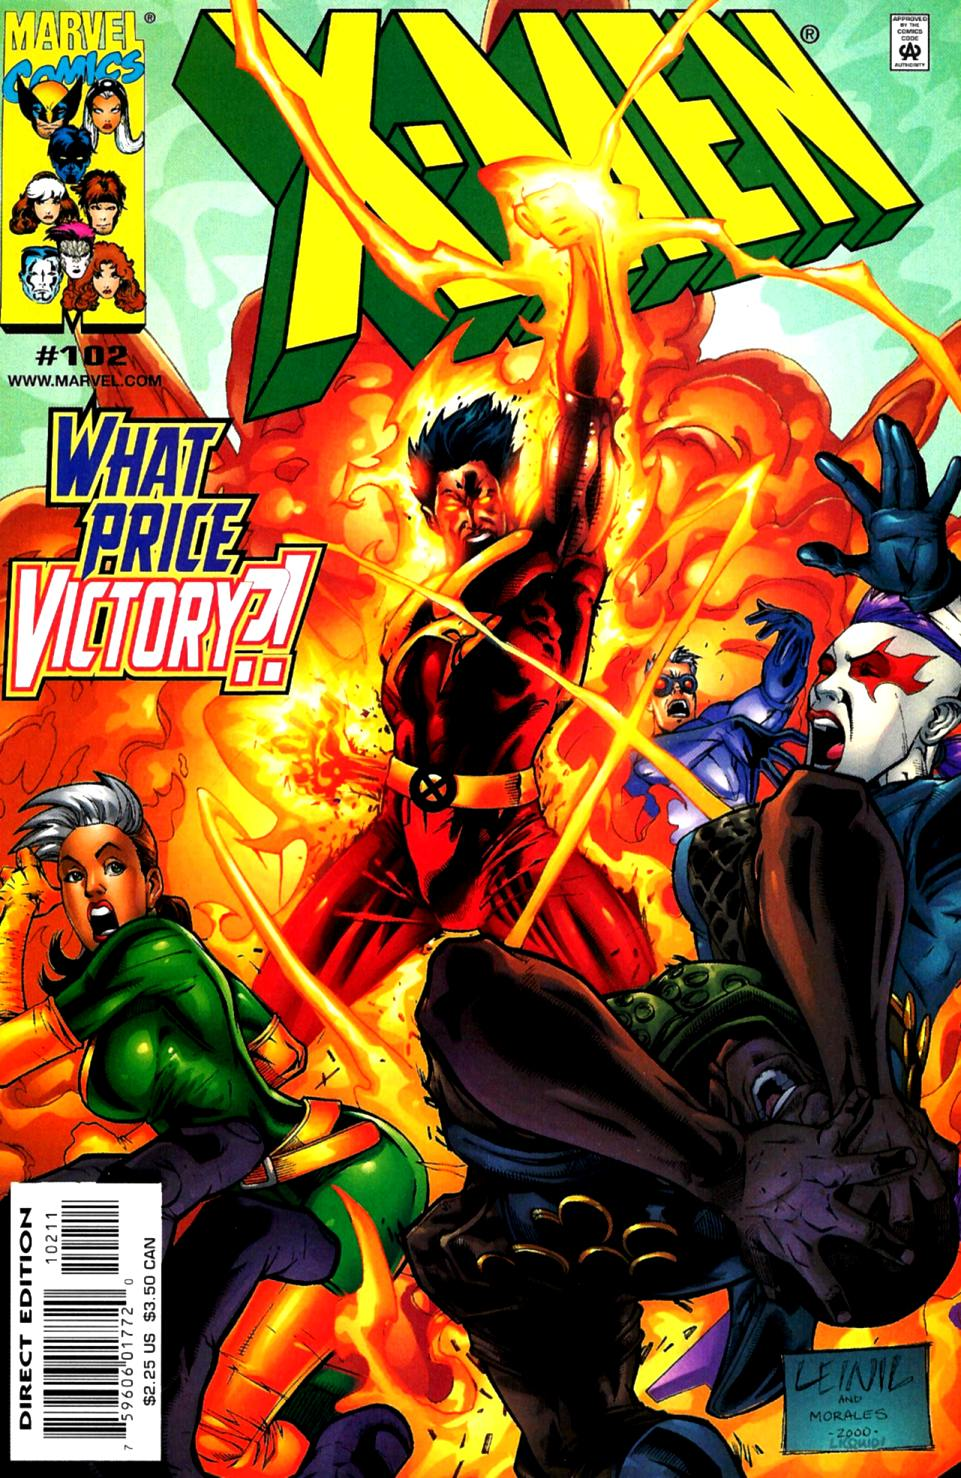 X-Men (1991) 102 Page 0